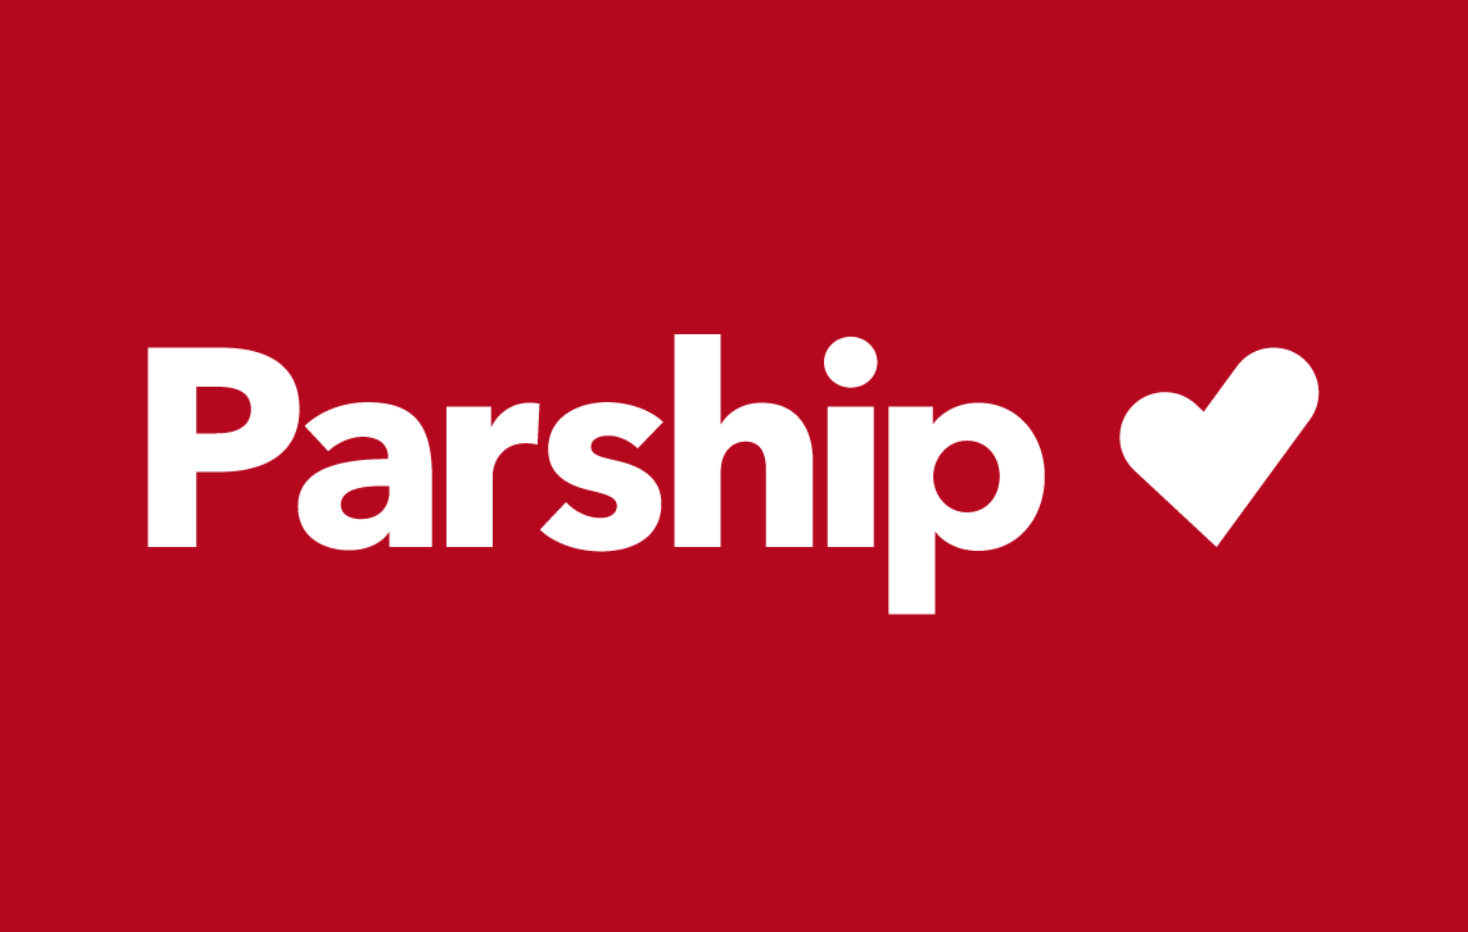 Parship Gets New Logo As ProSiebenSat.1 Begins TV Push